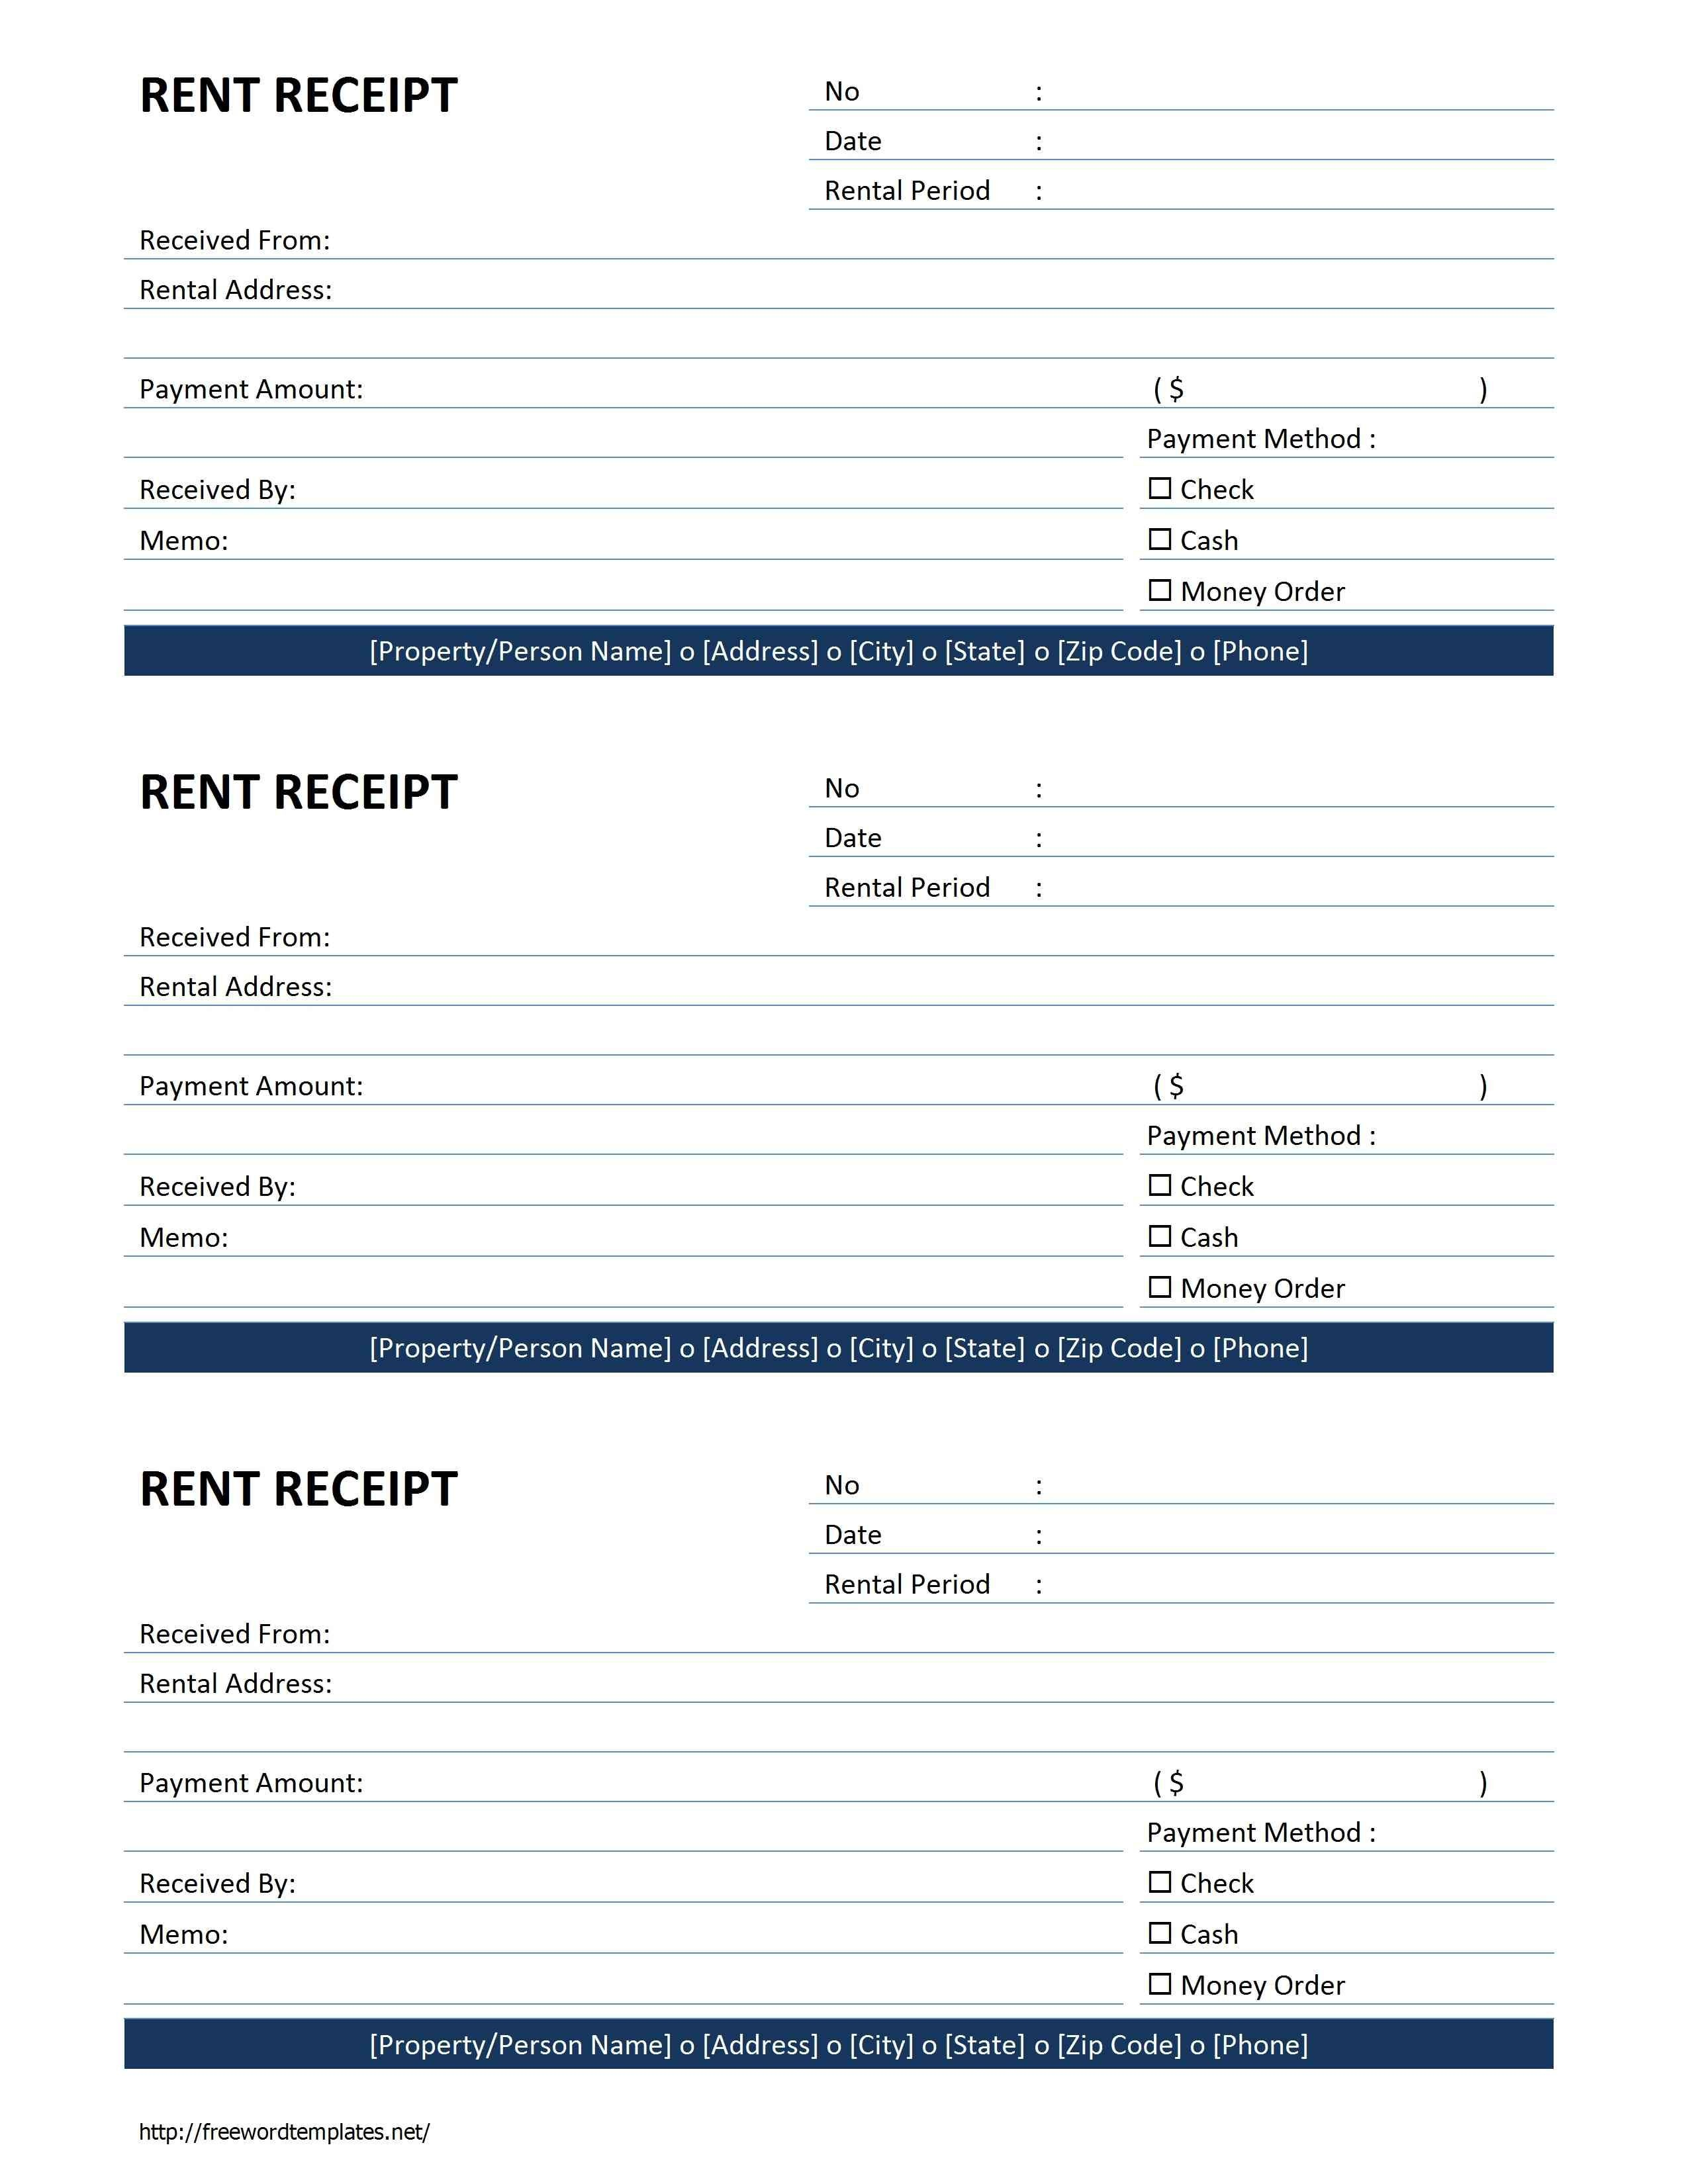 Rent Receipt Template   Free Microsoft Word Templates - Free Rent - Free Printable Rent Receipt